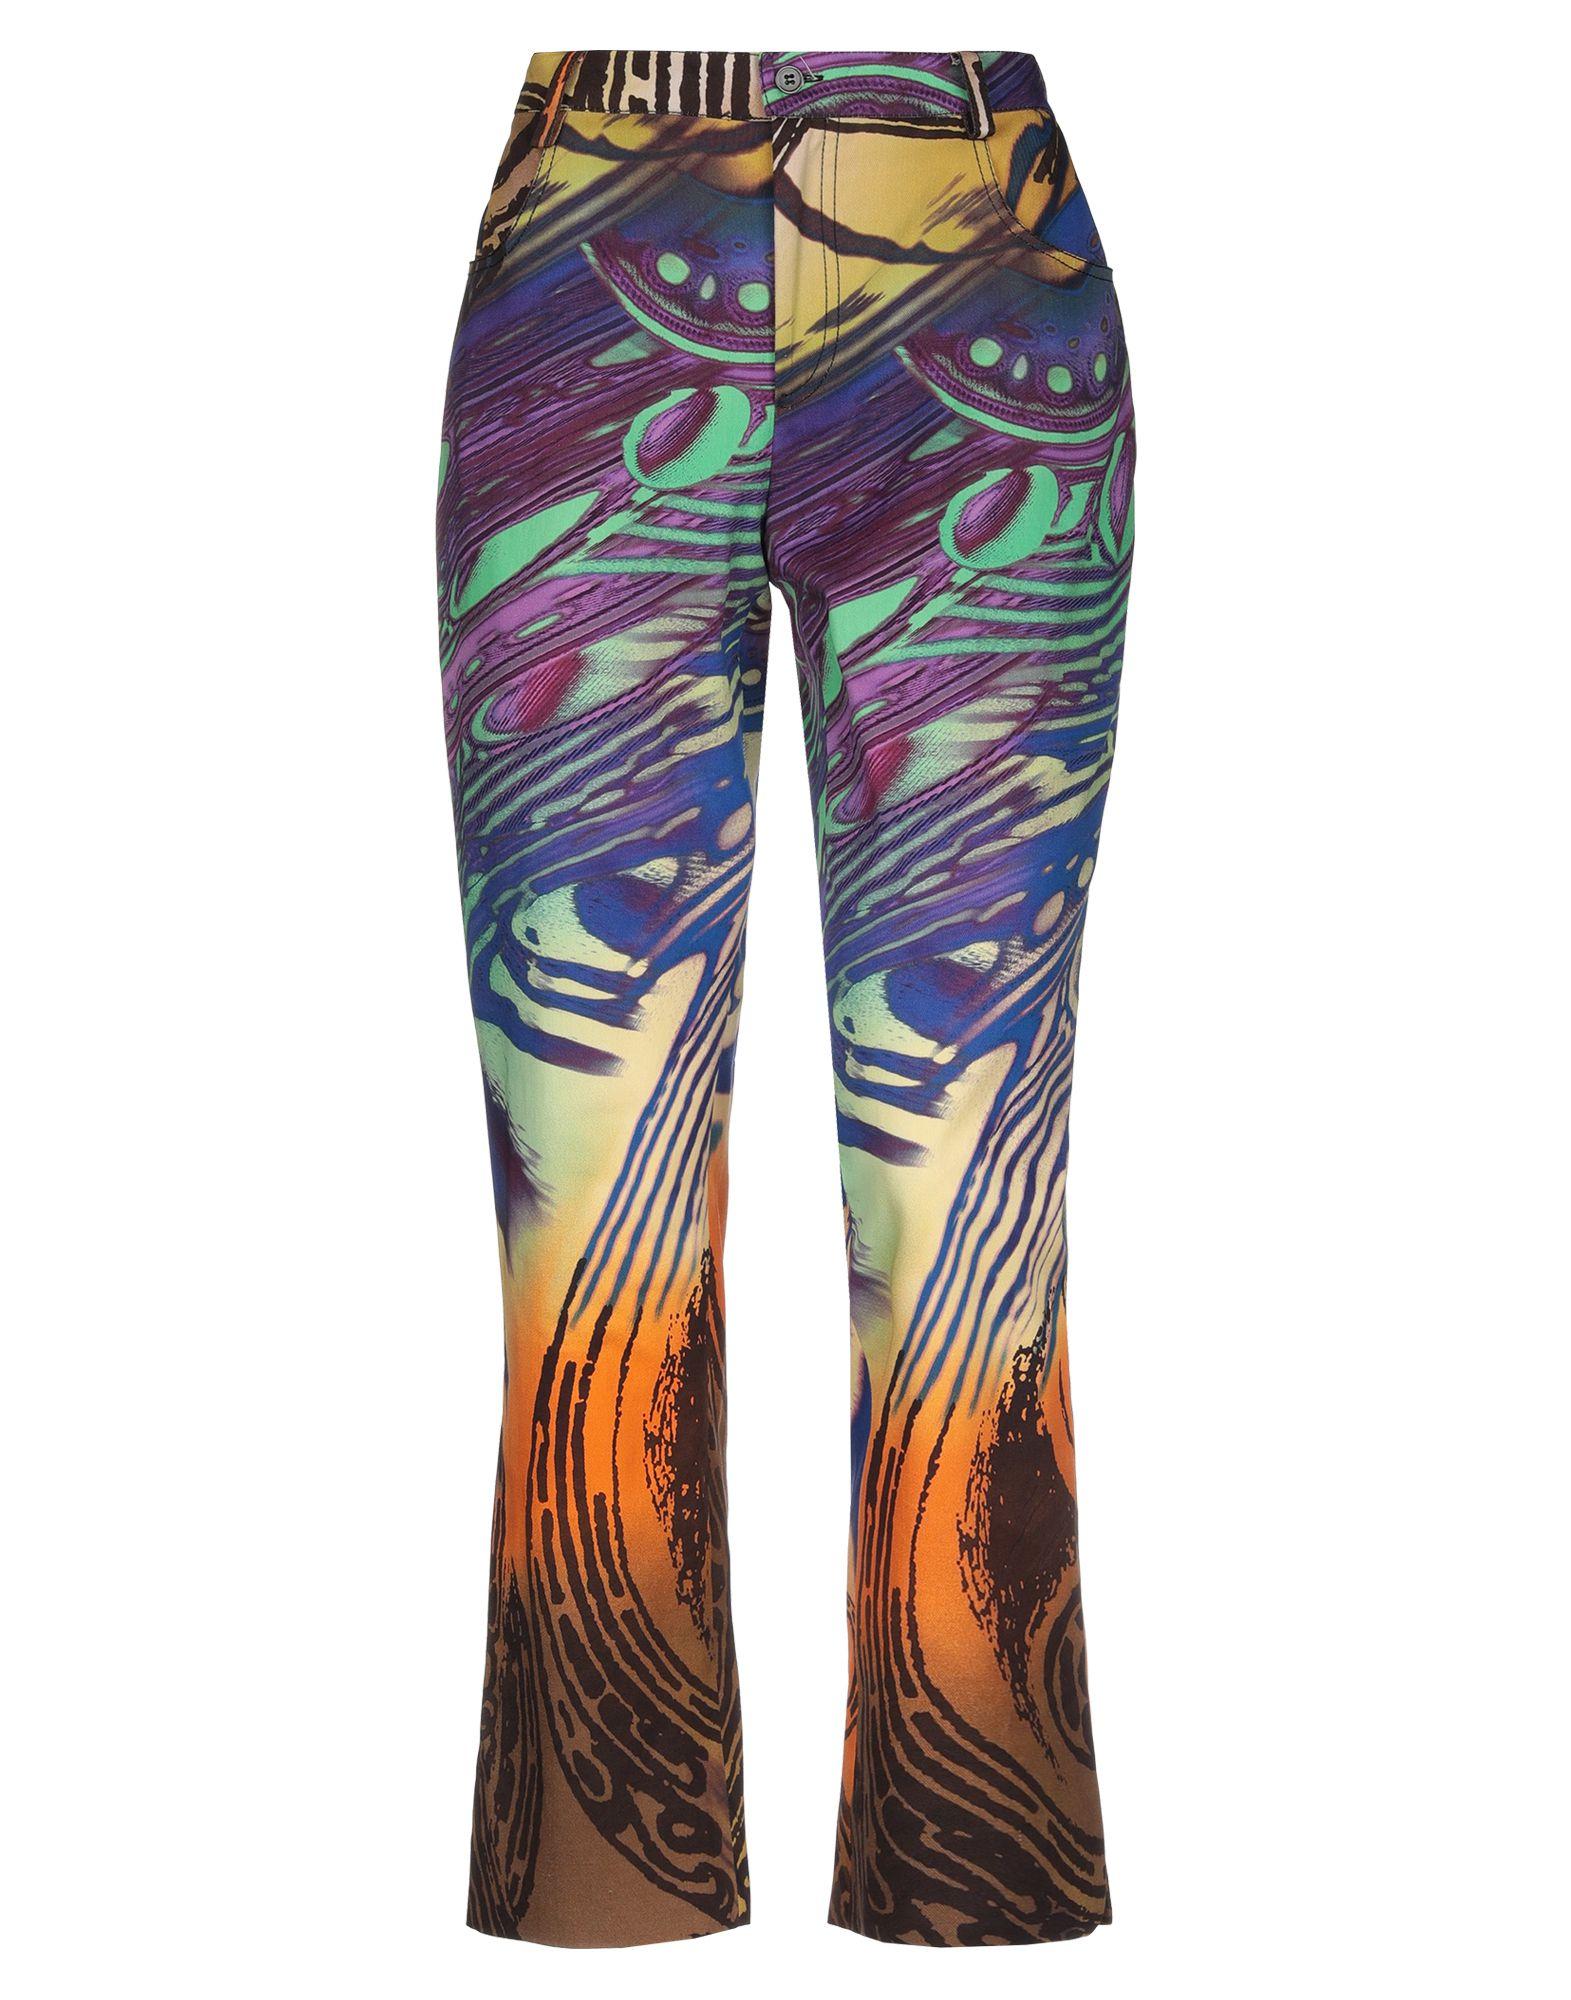 GAI MATTIOLO COUTURE Повседневные брюки gai mattiolo jeans джинсовые брюки